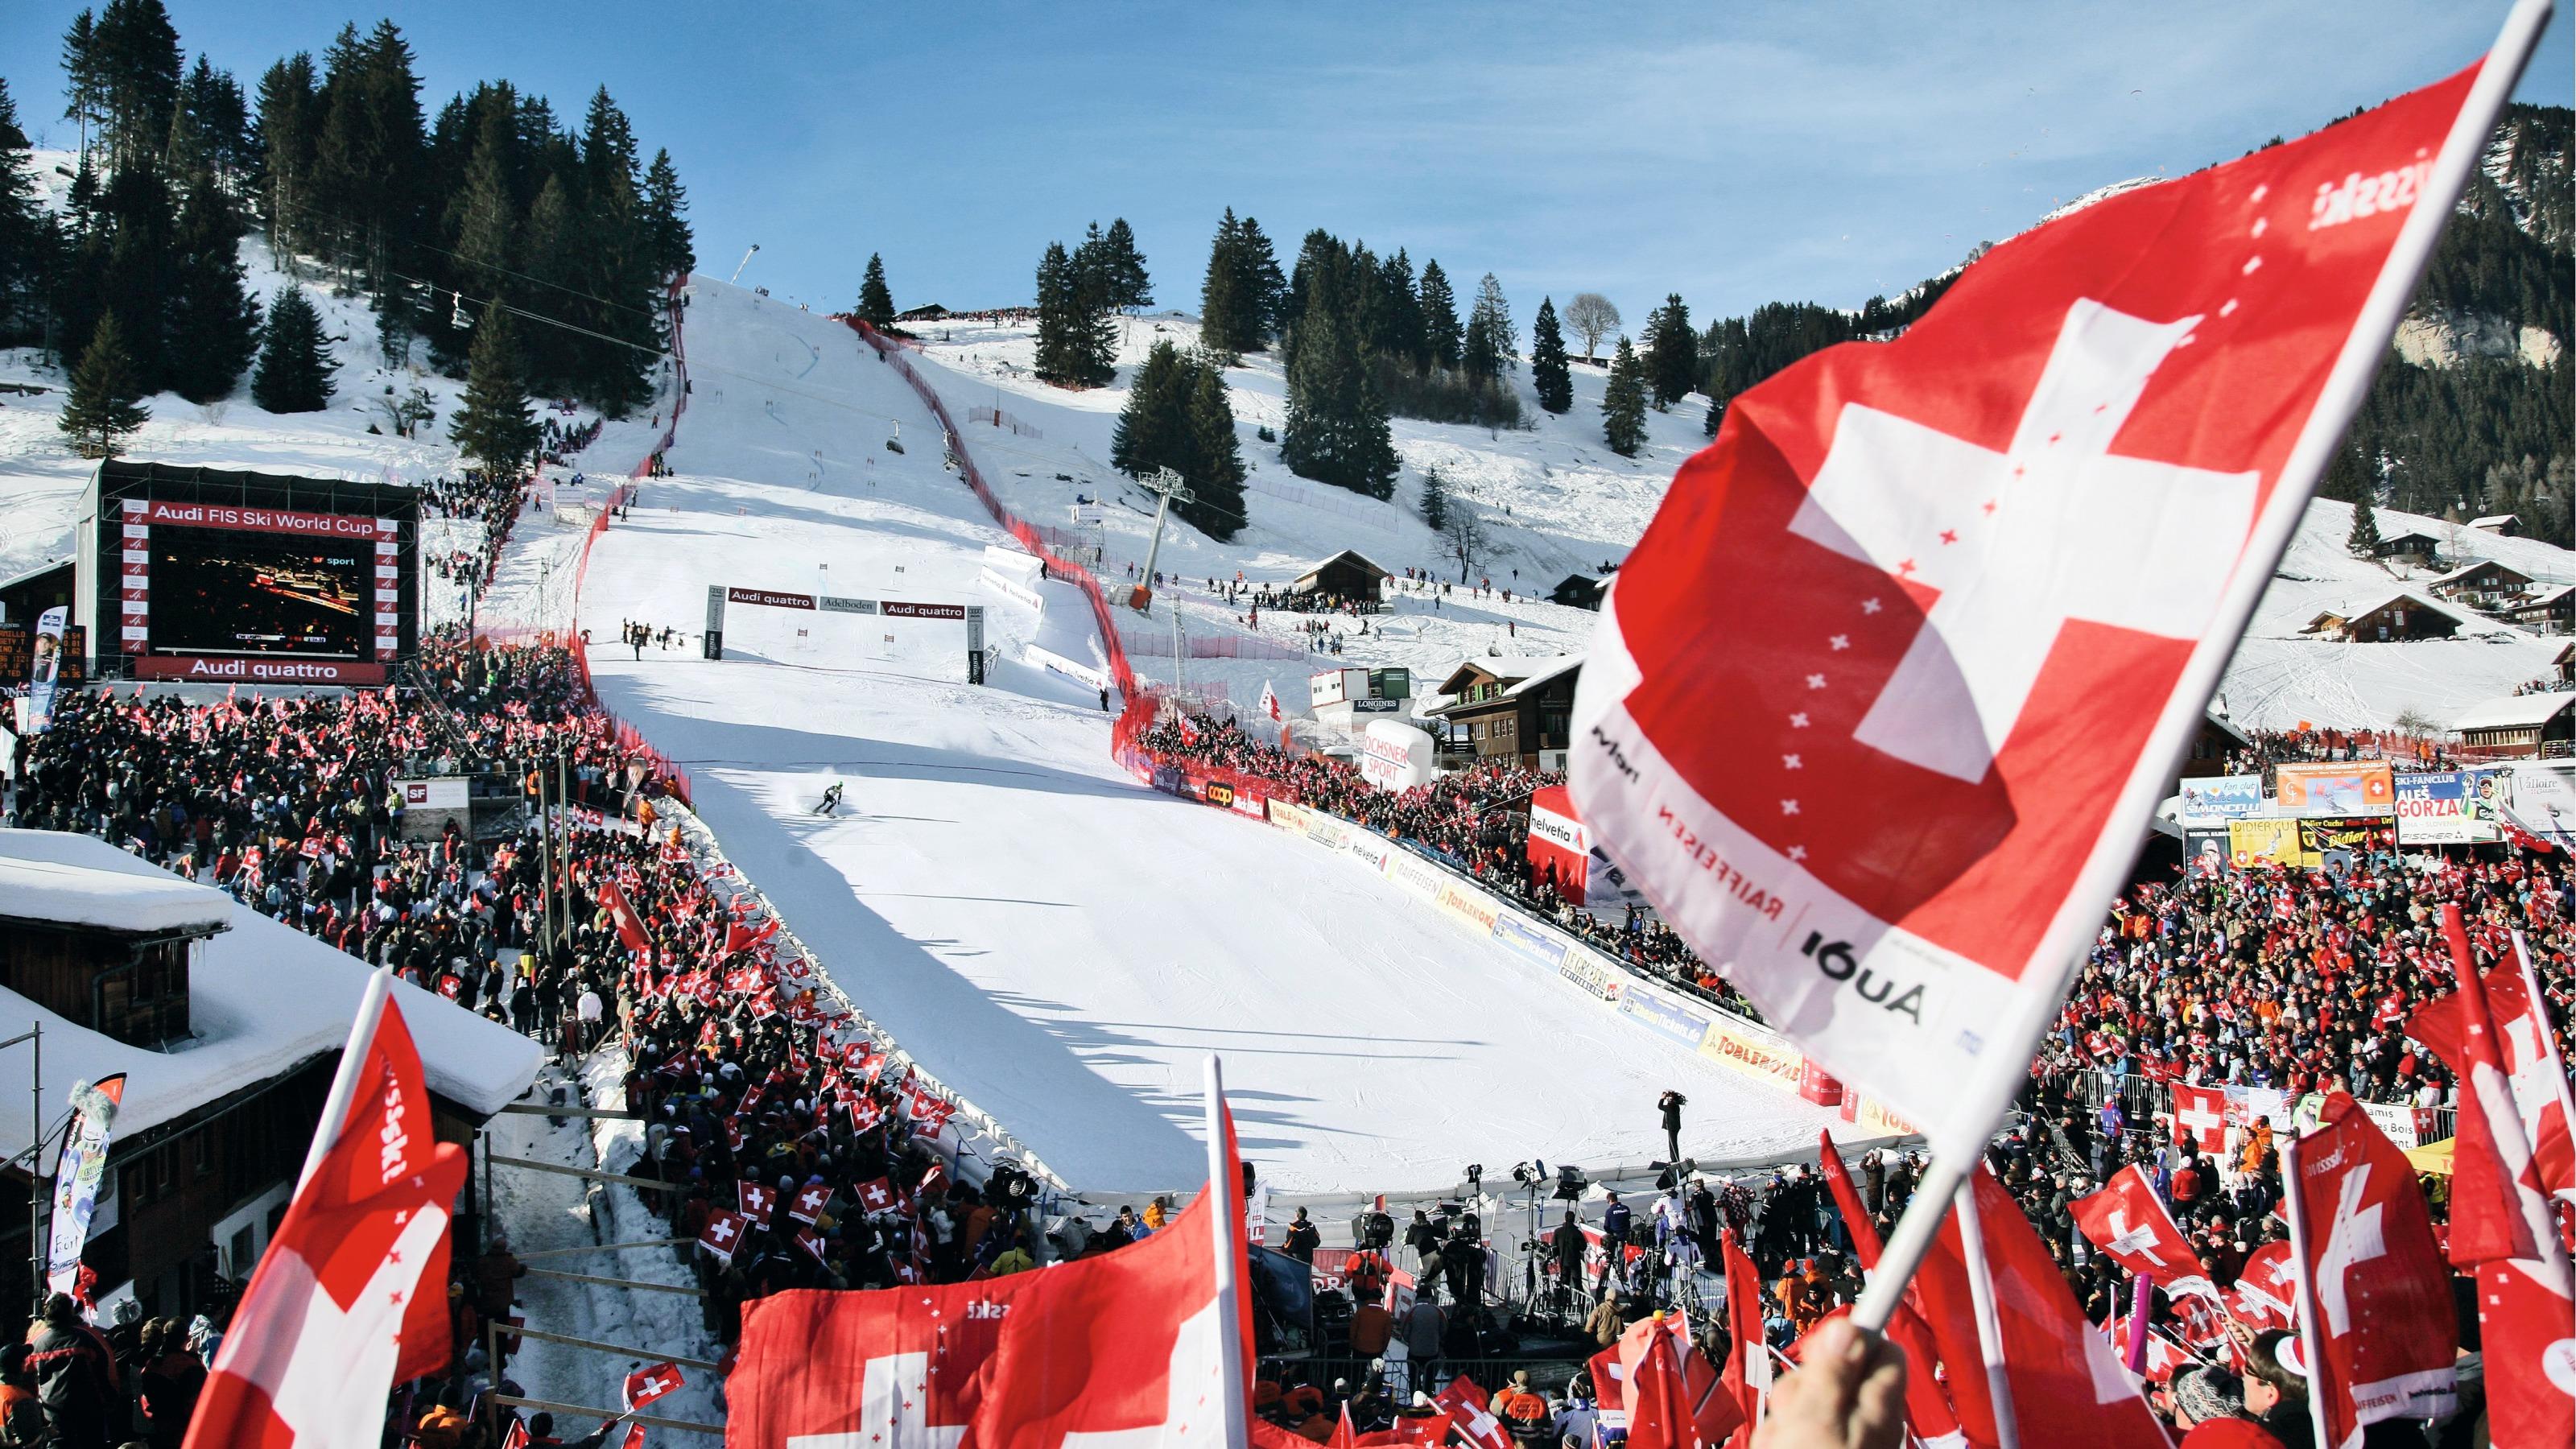 World Cup Skiing In Adelboden Switzerland Tourism